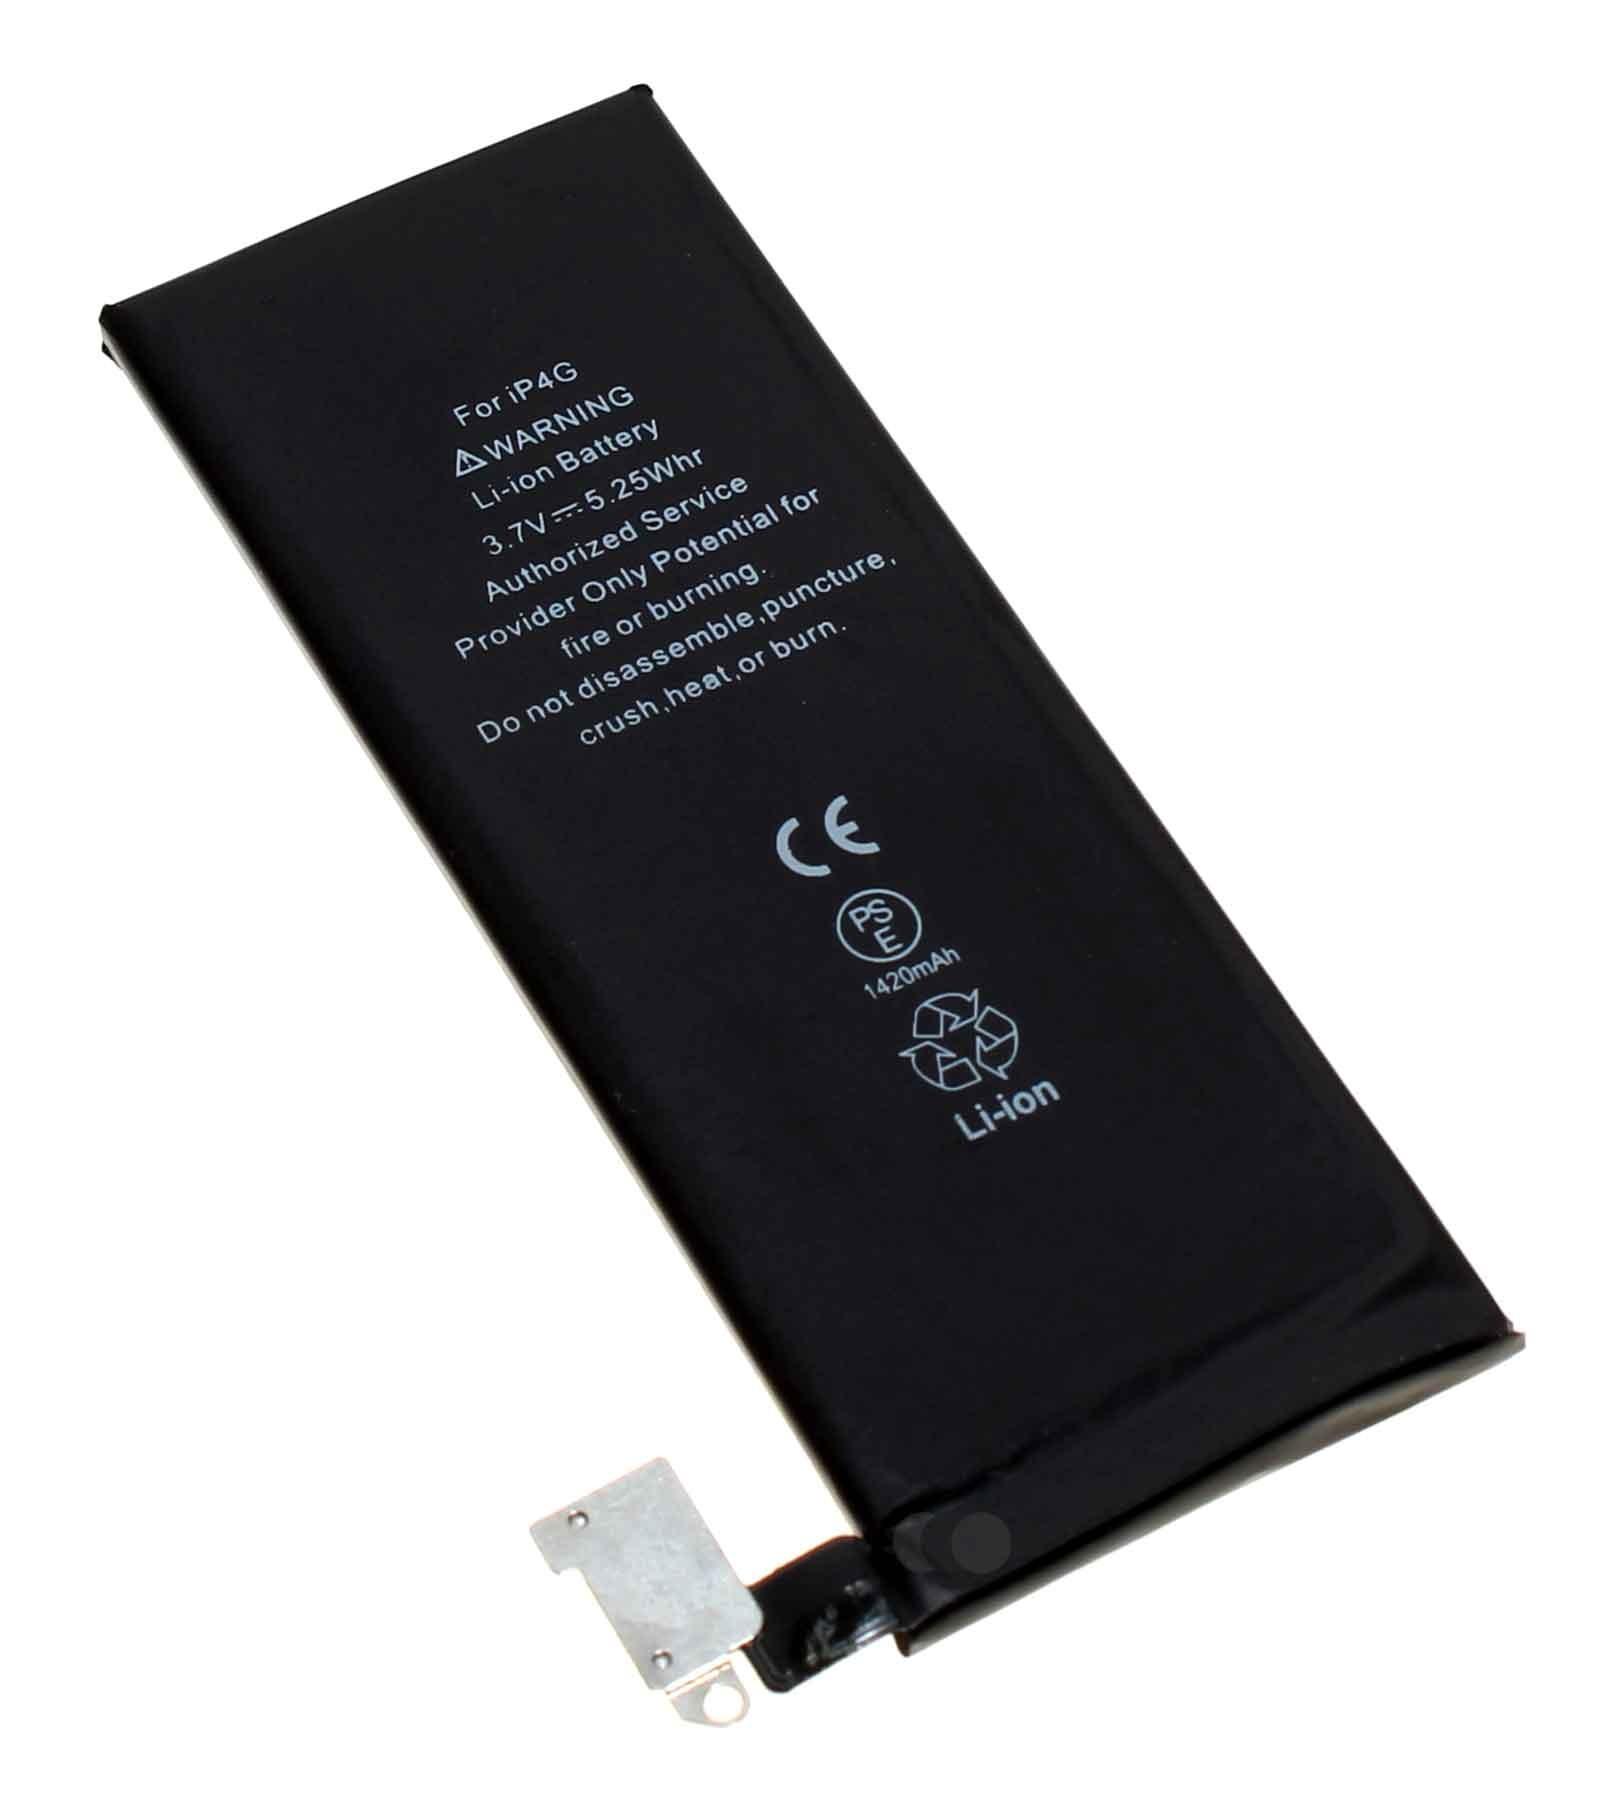 Akku passend für Apple iPhone 4, APN 616-0513, A1332, A1349